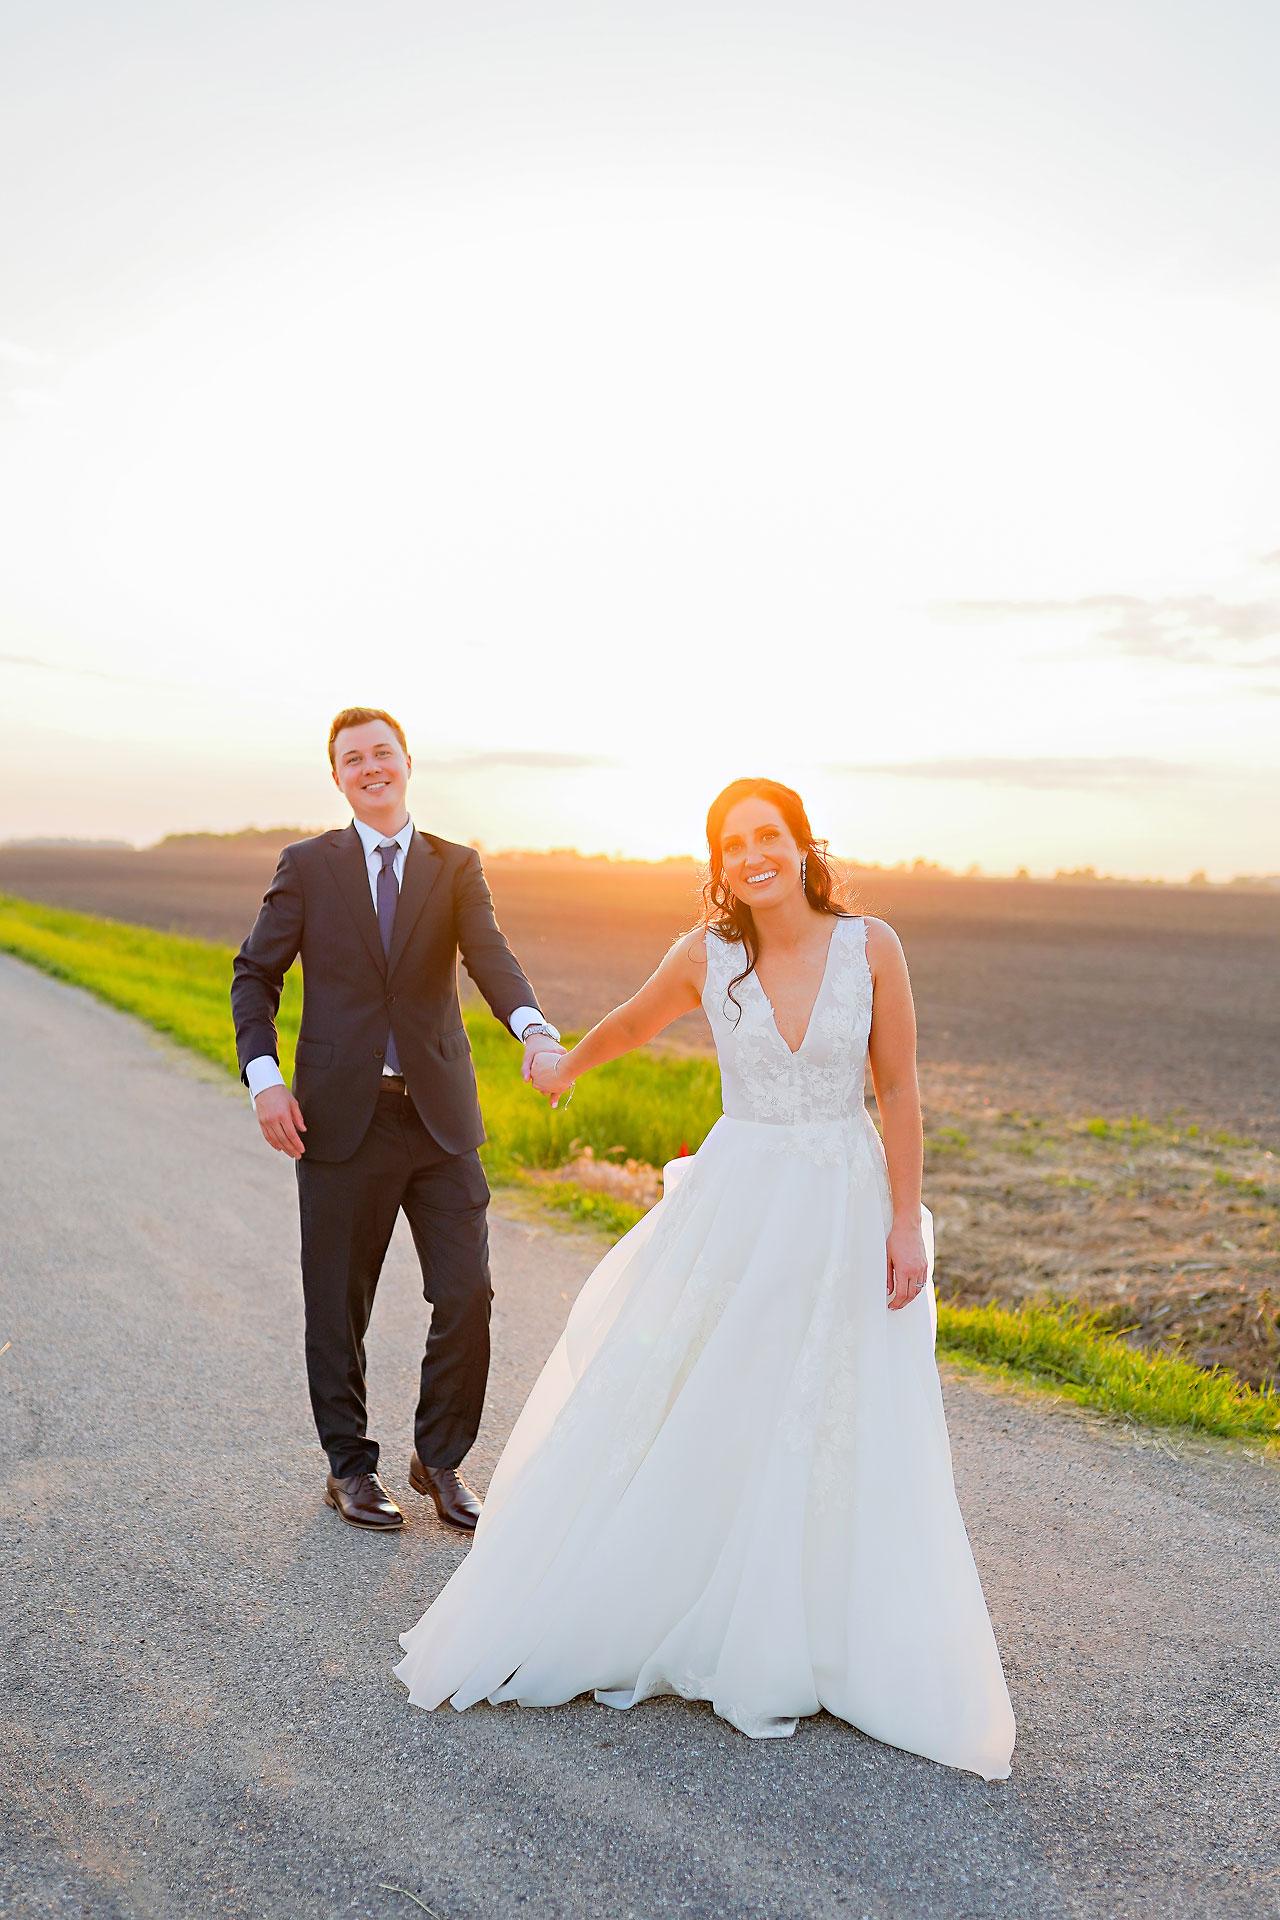 MacKinze John Lafayette Indiana Purdue Wedding 263